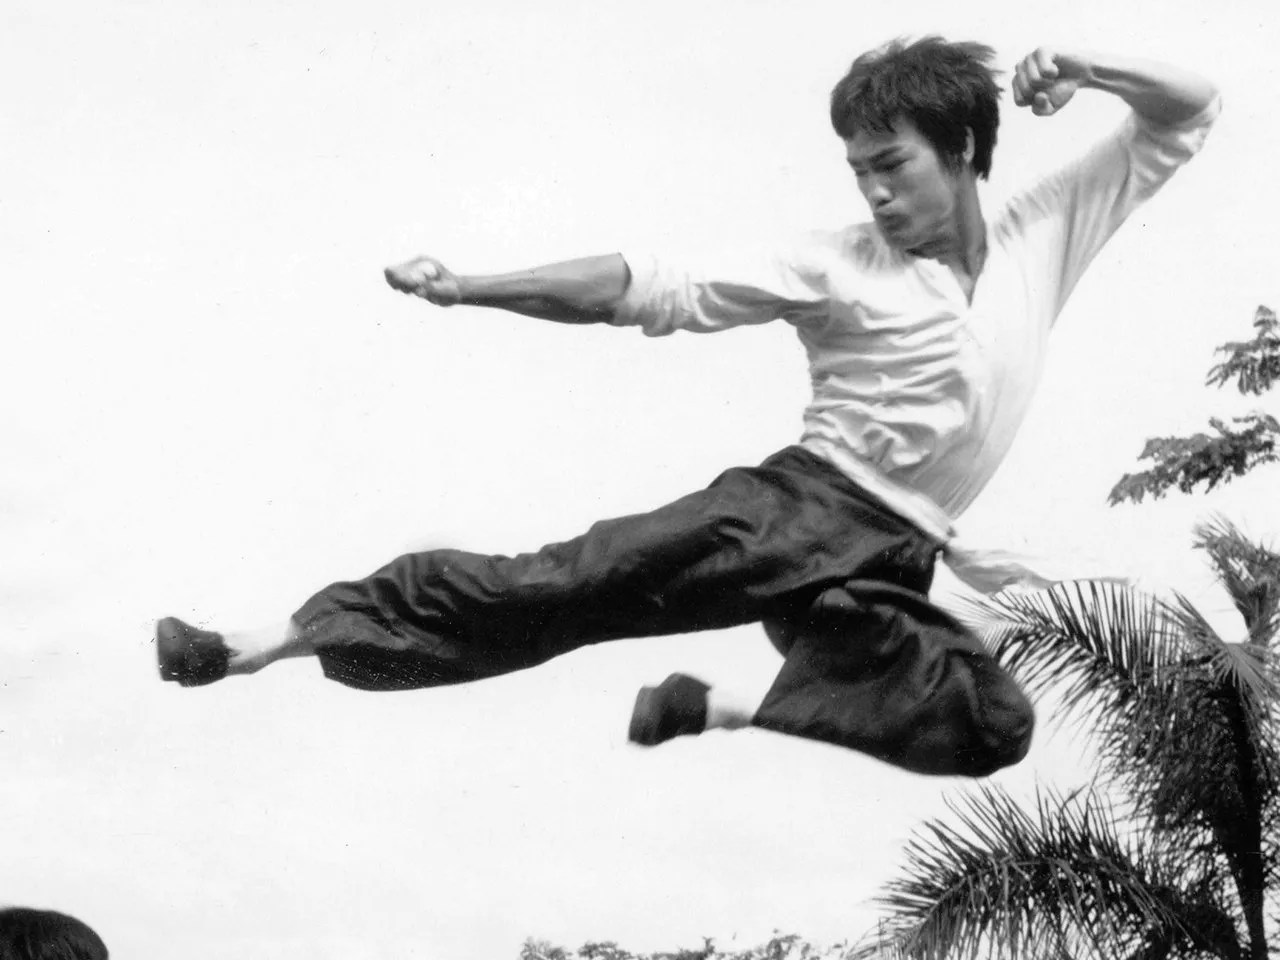 bruce lee flying kick